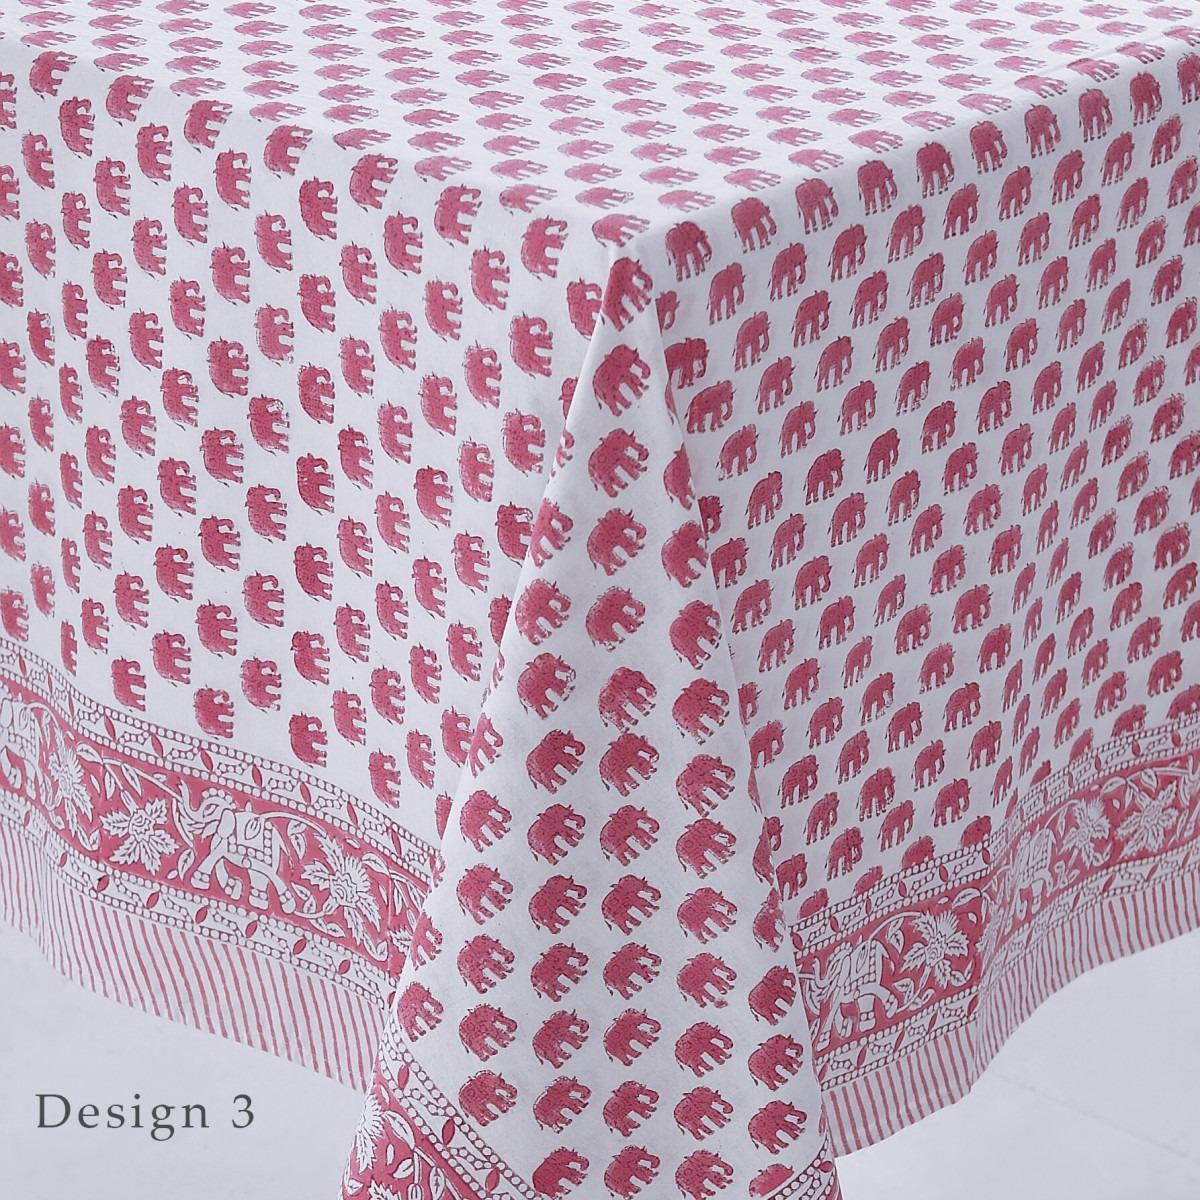 Block Printed Tablecloth Design 7